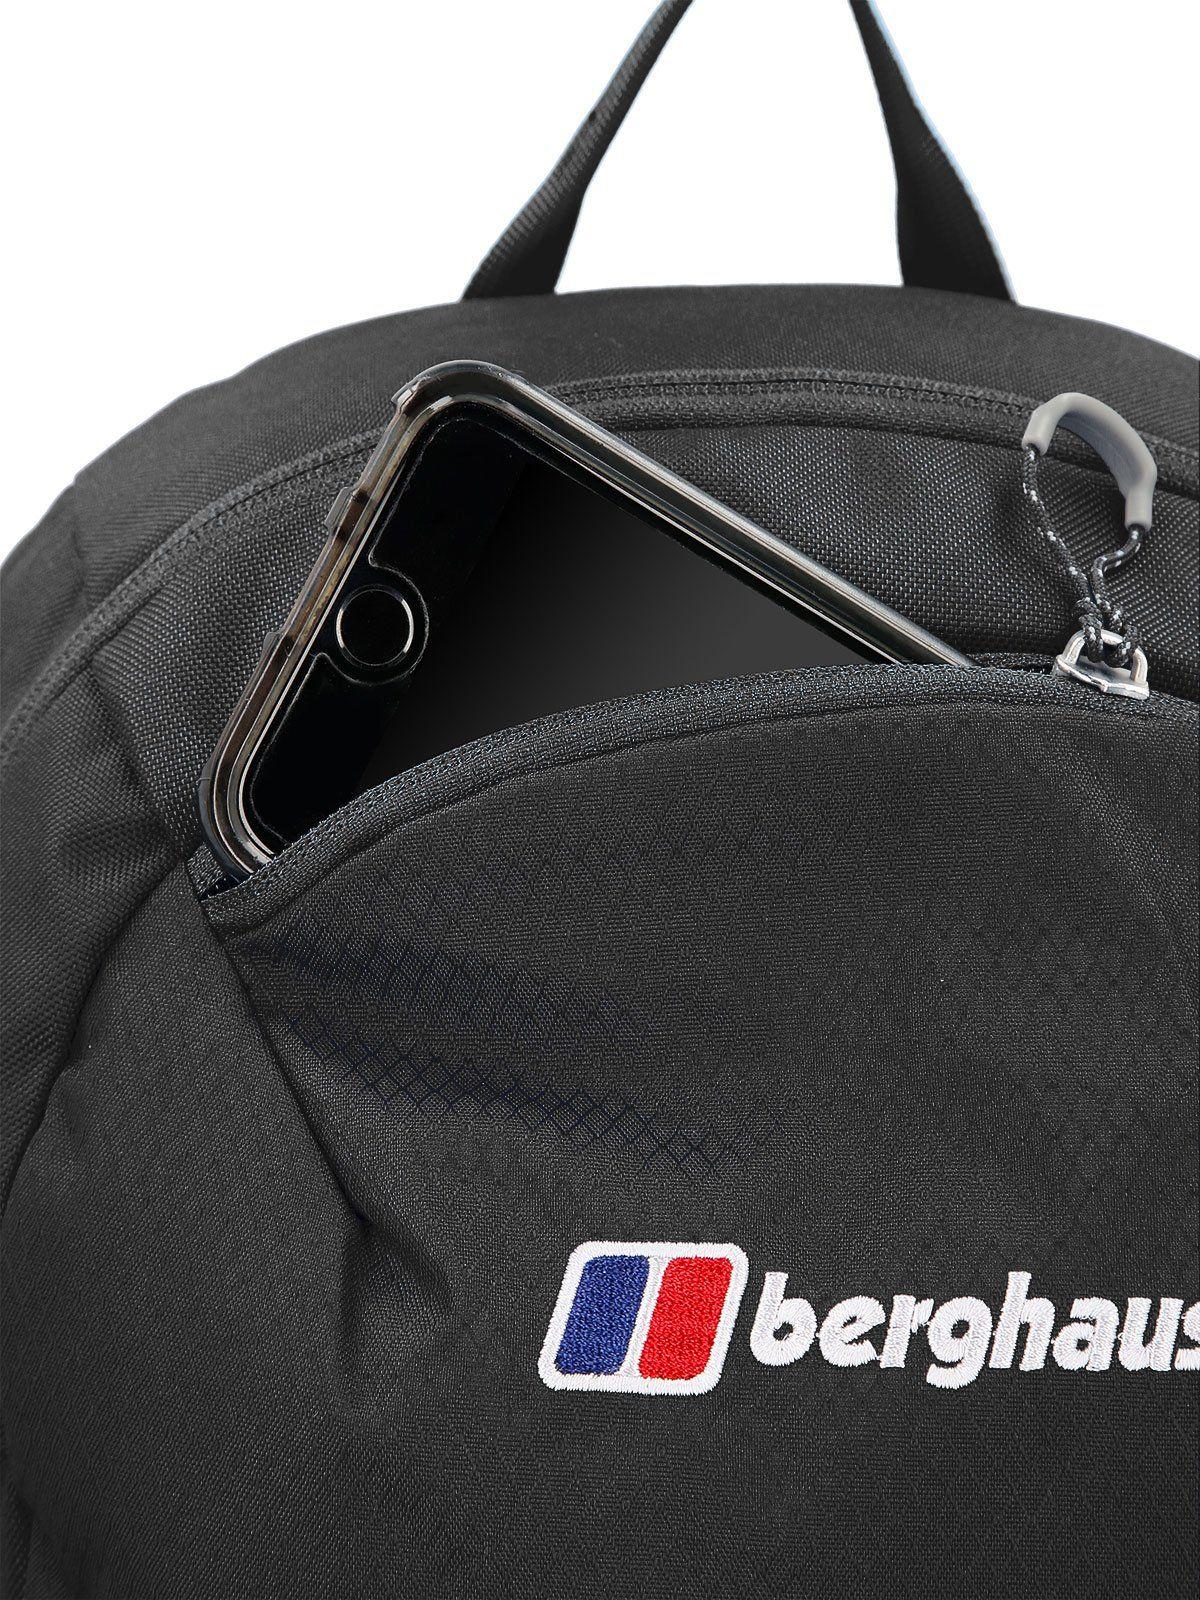 Berghaus TwentyFourSeven Plus 20L Ruck Sack